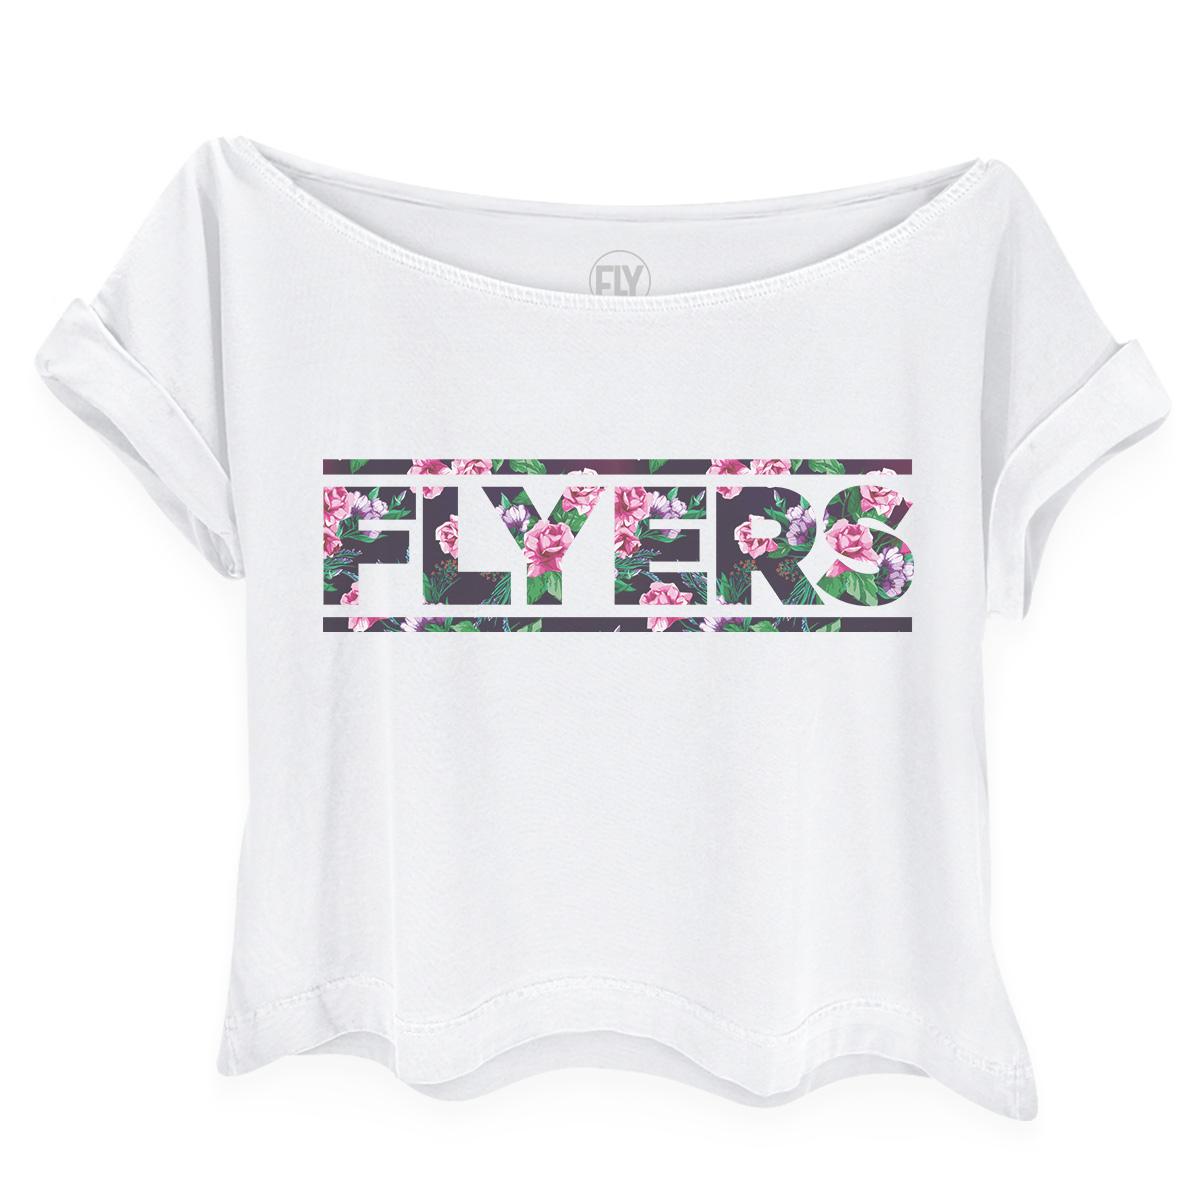 Camiseta Gola Canoa Banda Fly Flyers